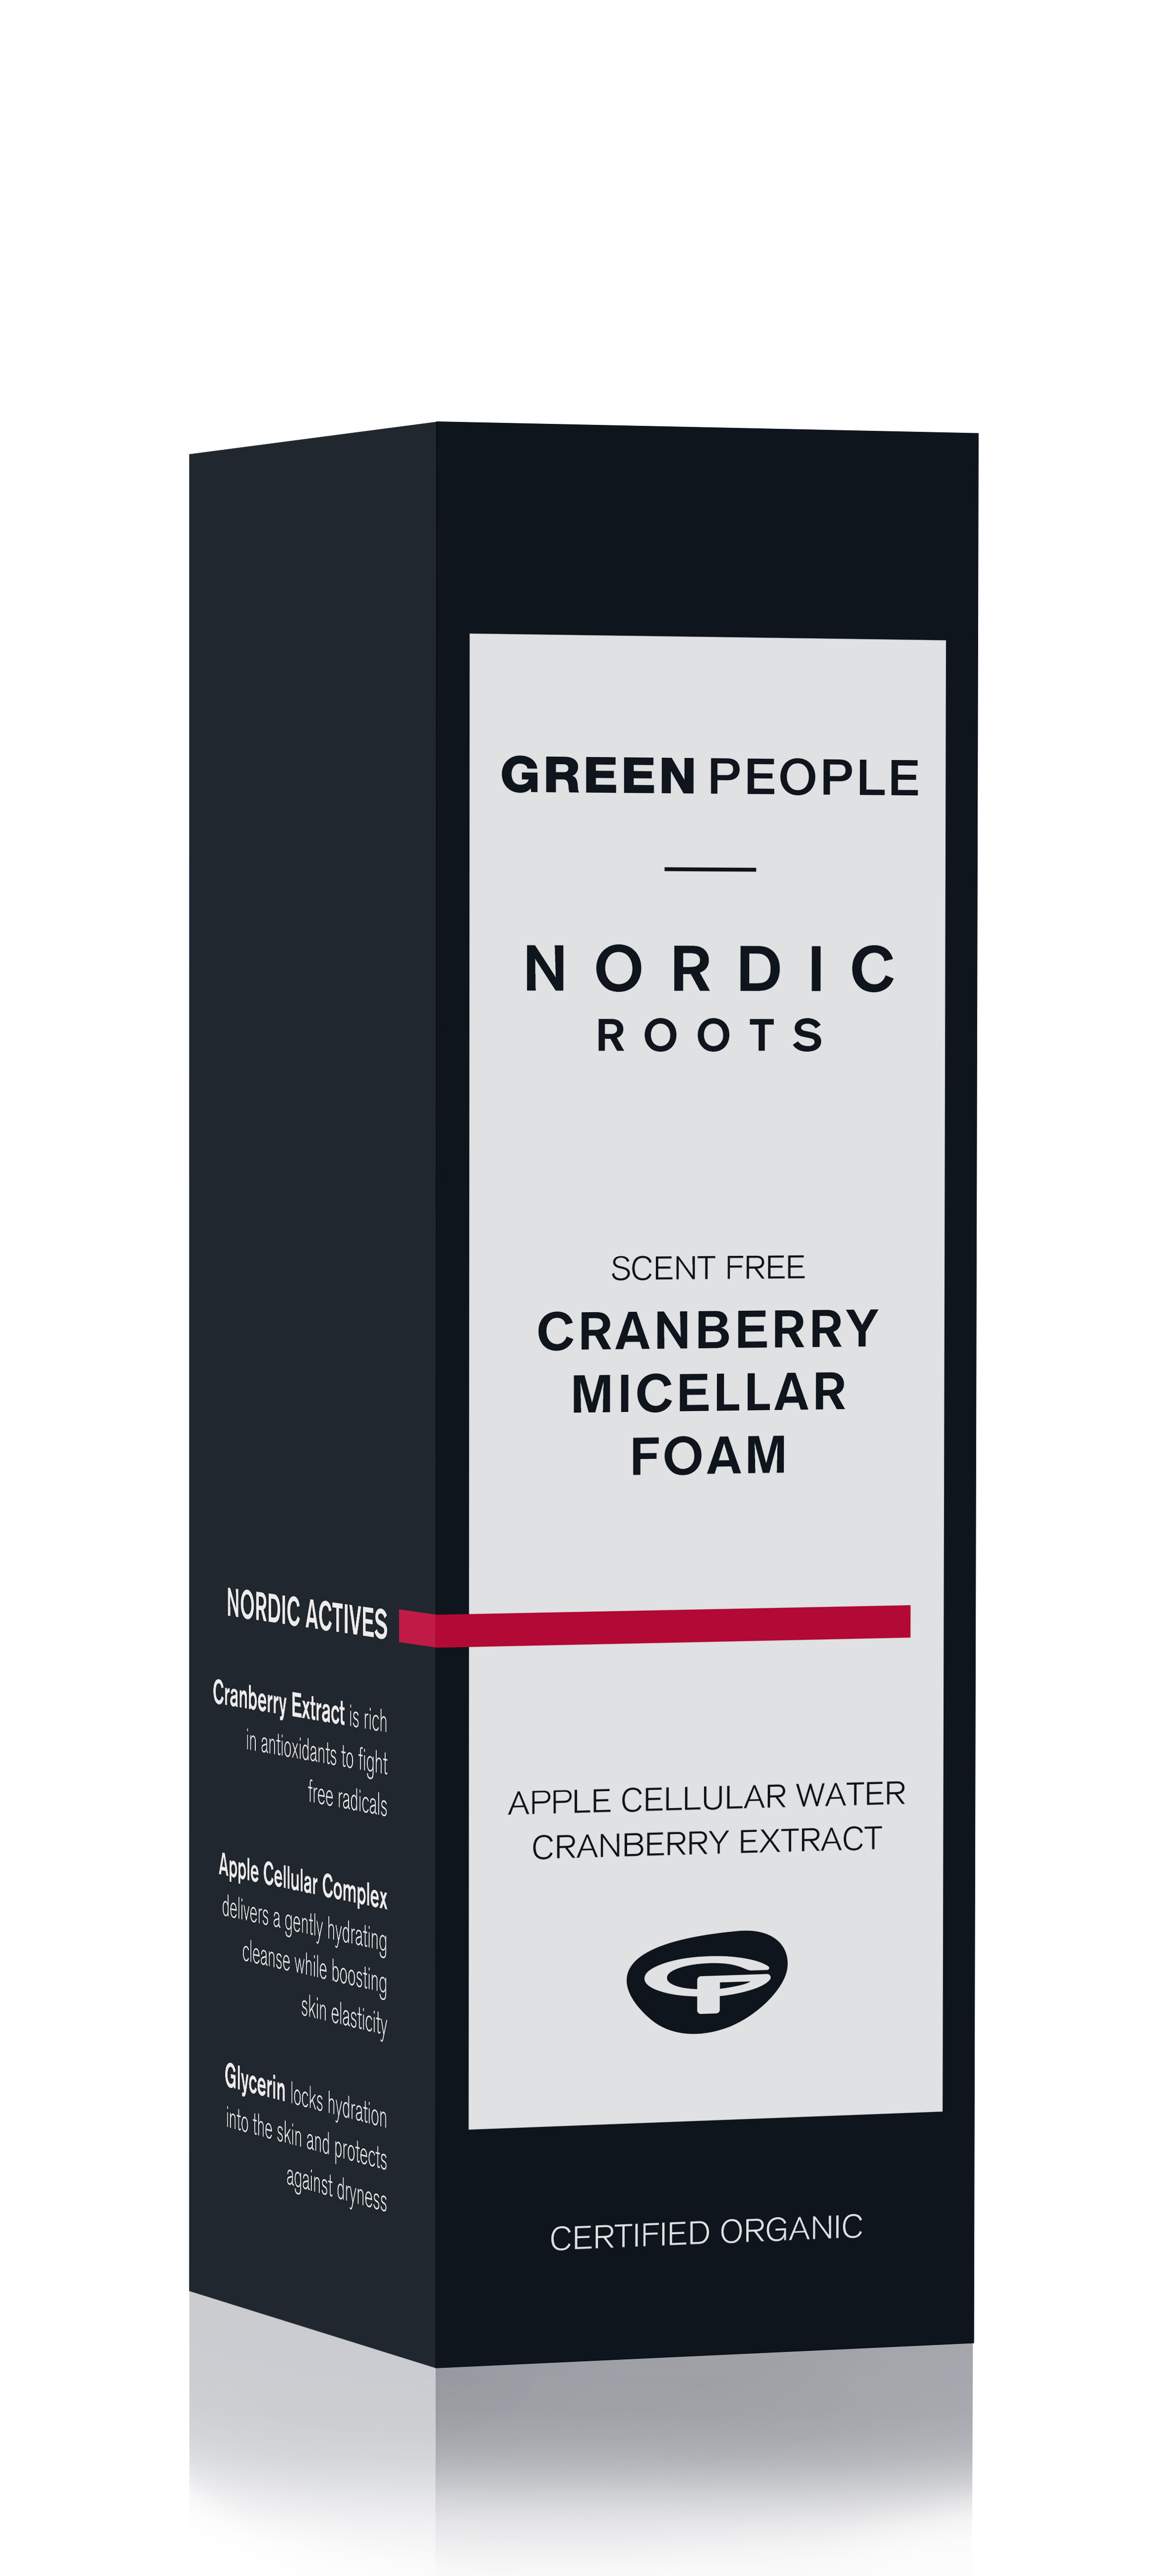 Nordic Roots Cranberry Micellar Foam 150ml